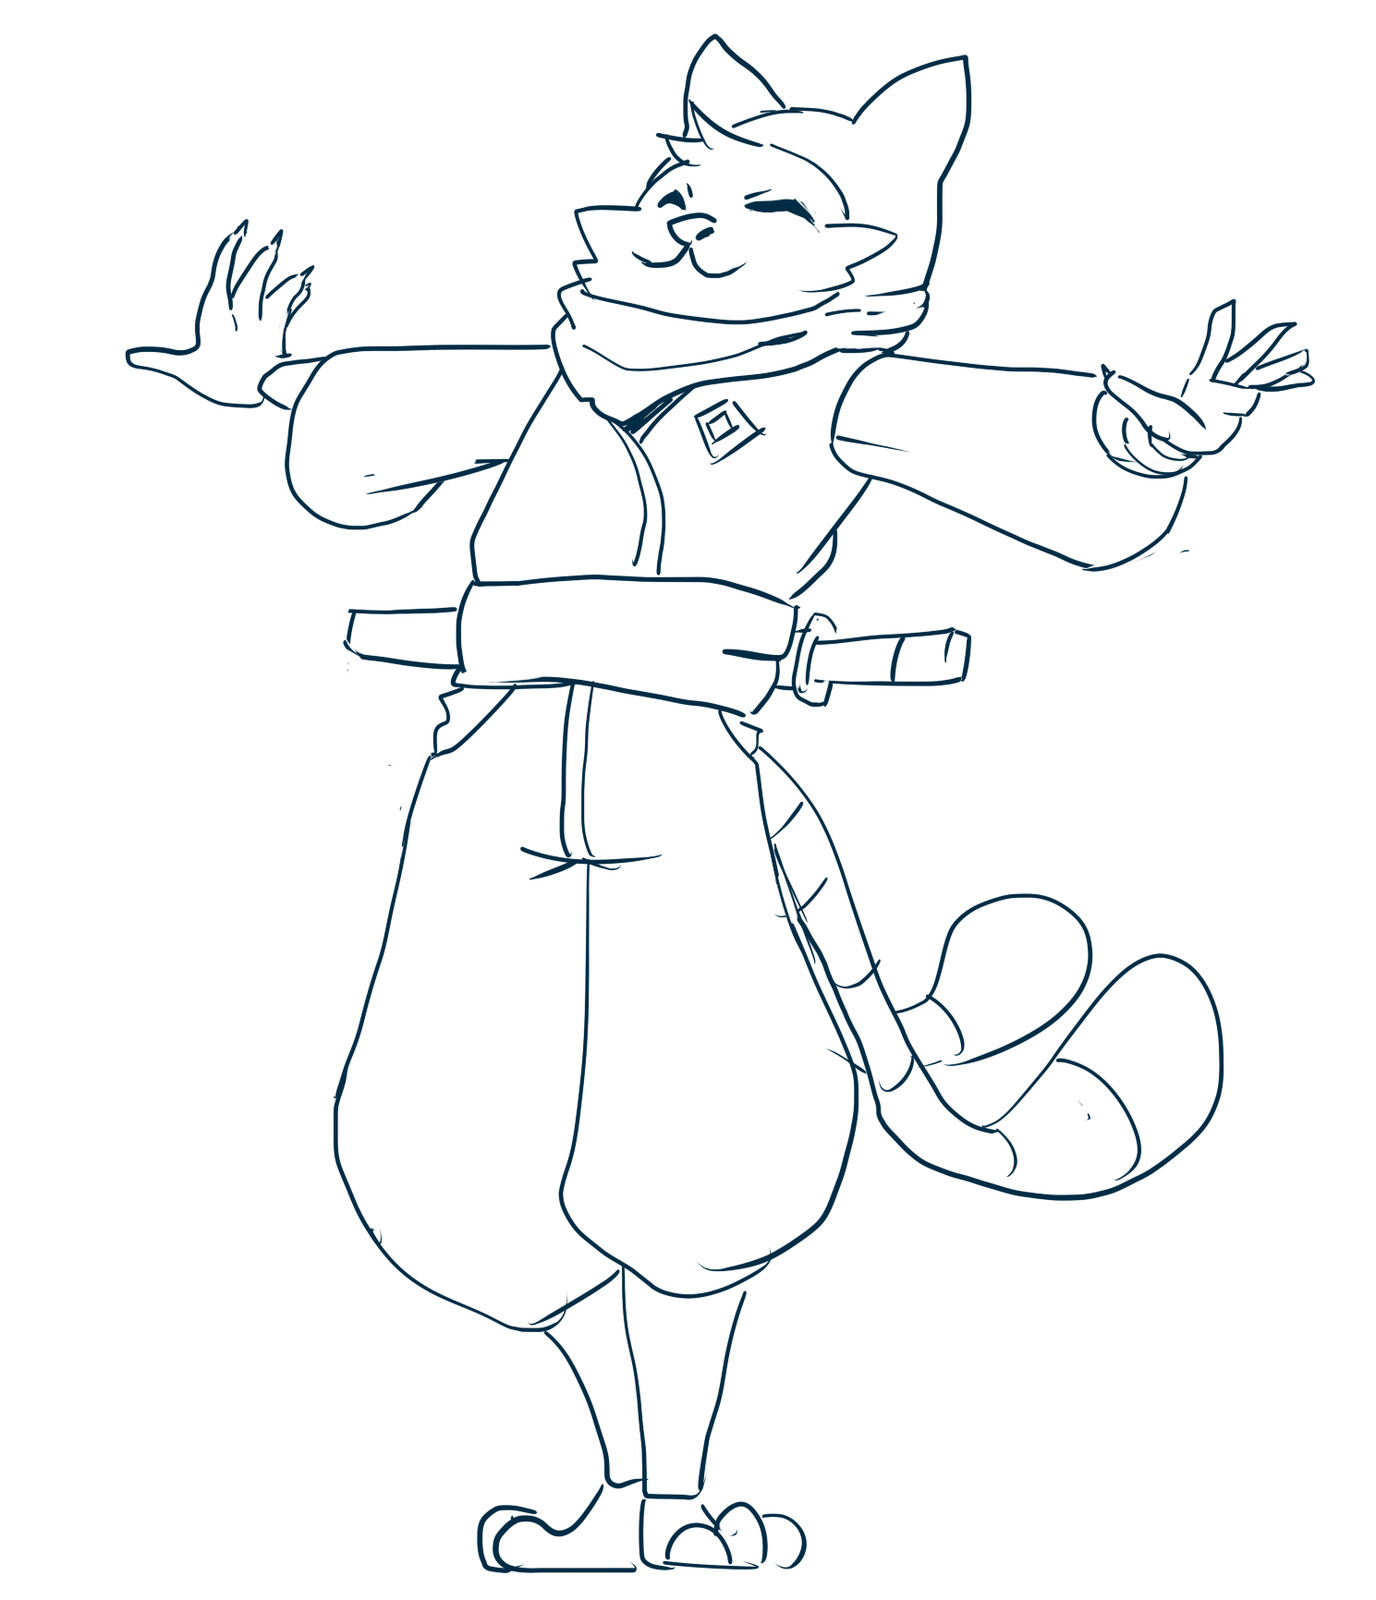 Ninja cat Nao